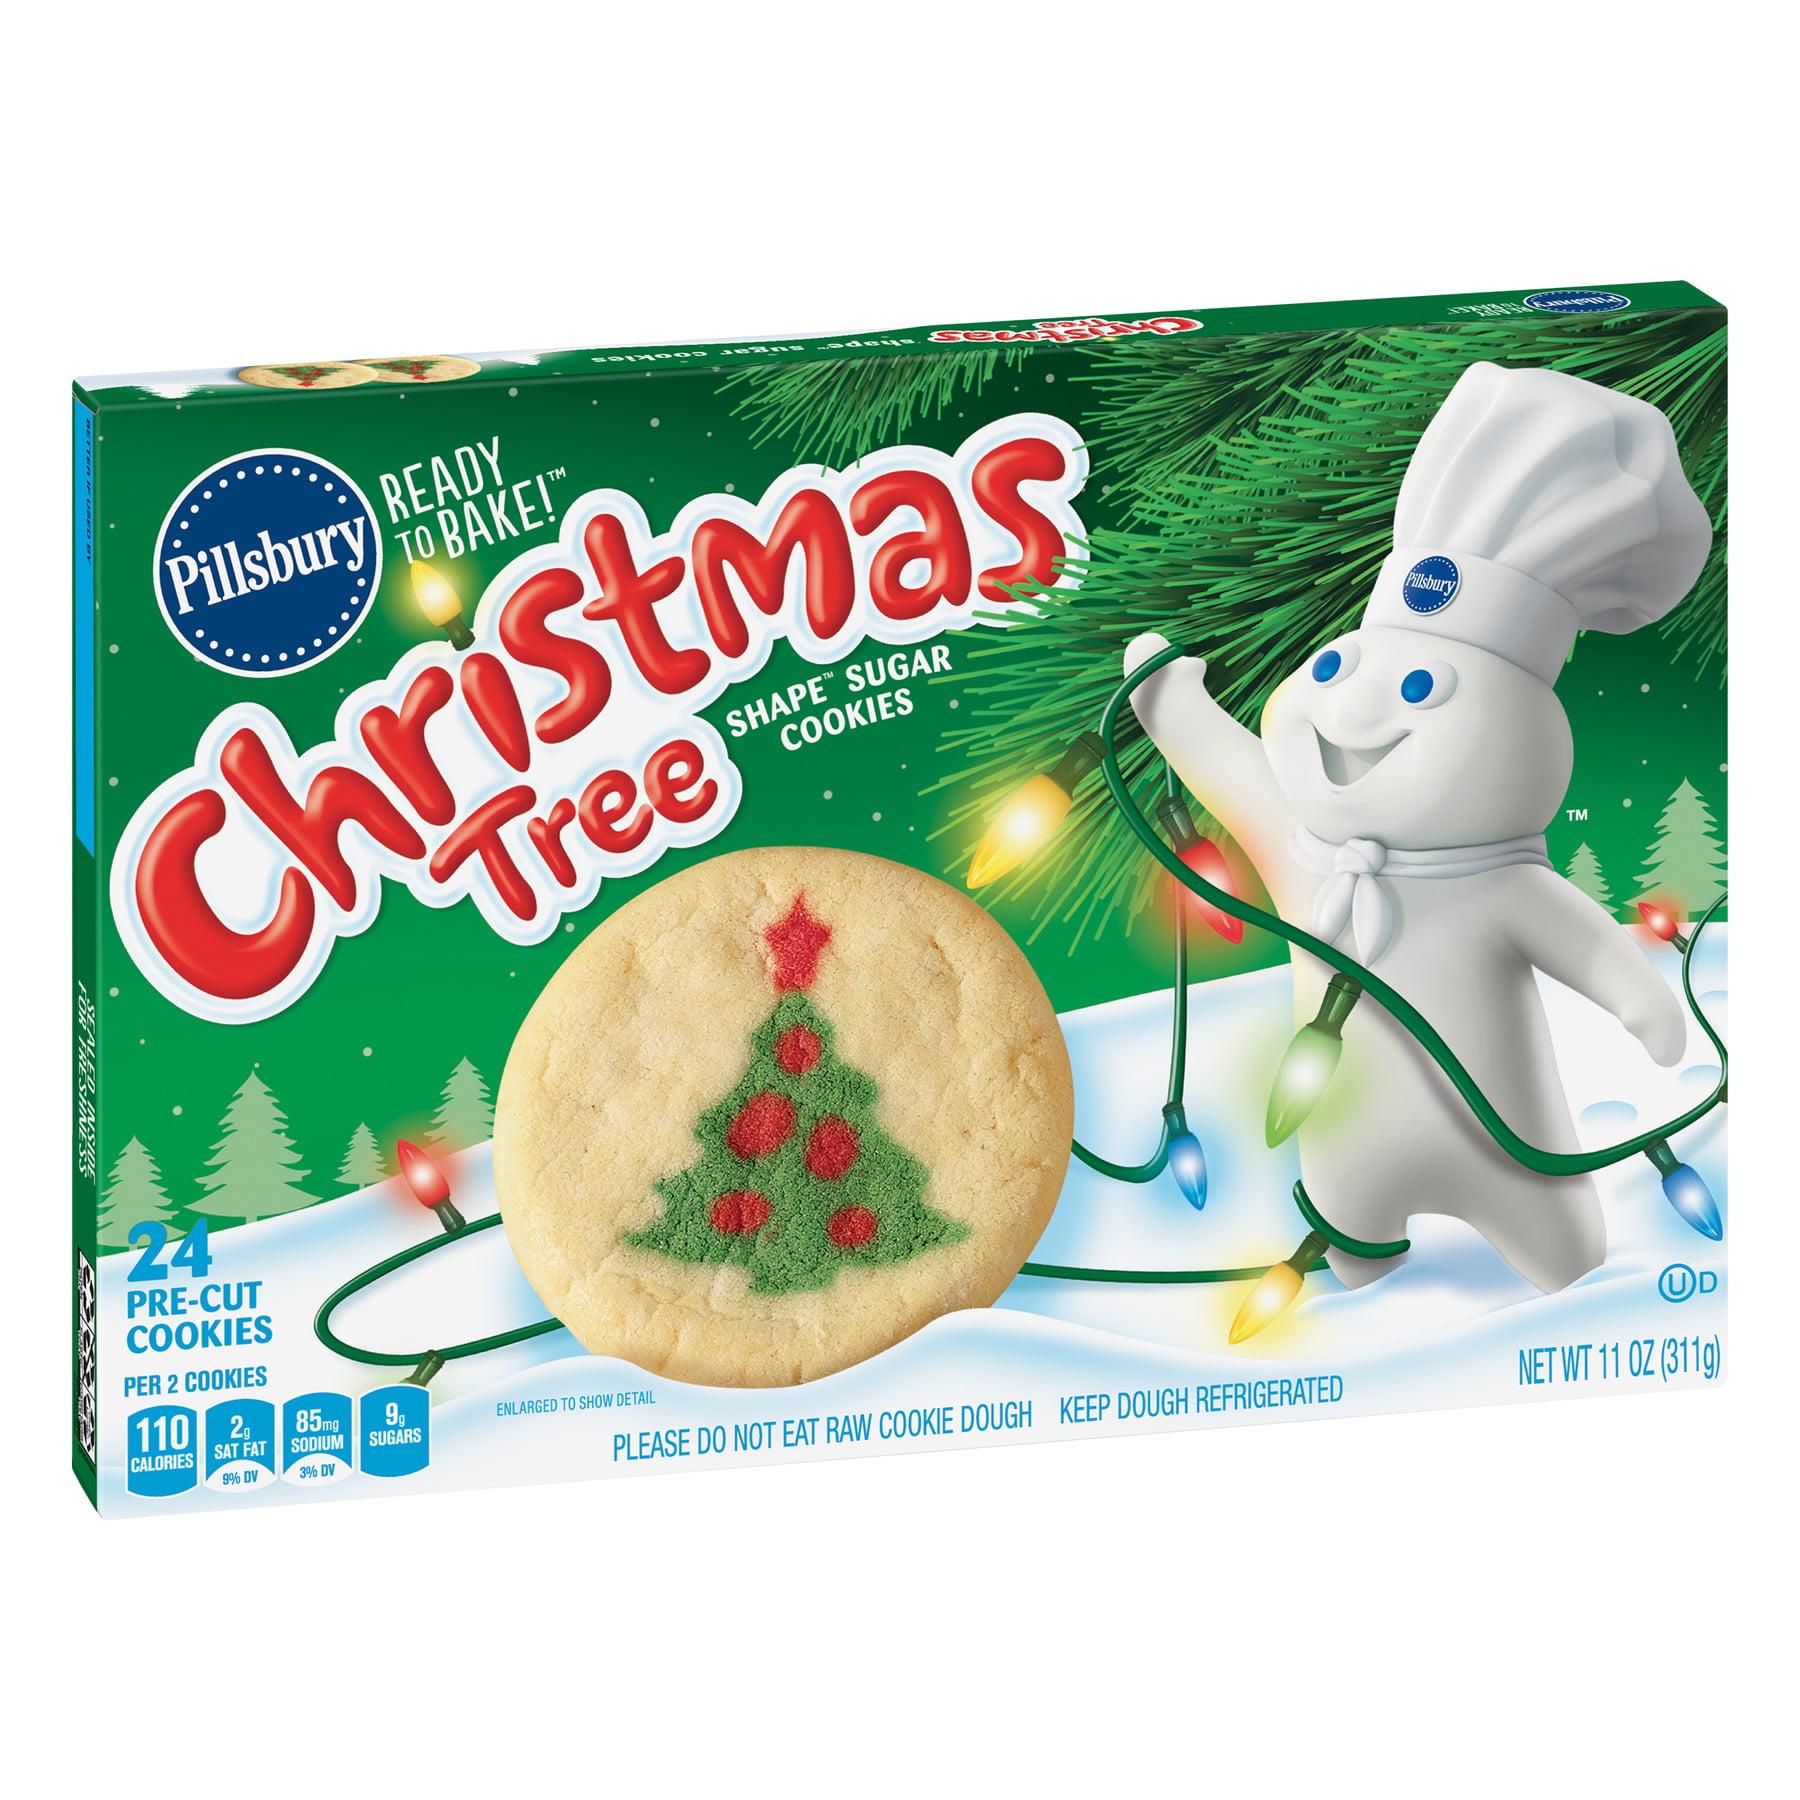 Pillsbury Ready To Bake Christmas Tree Shape Sugar Cookies